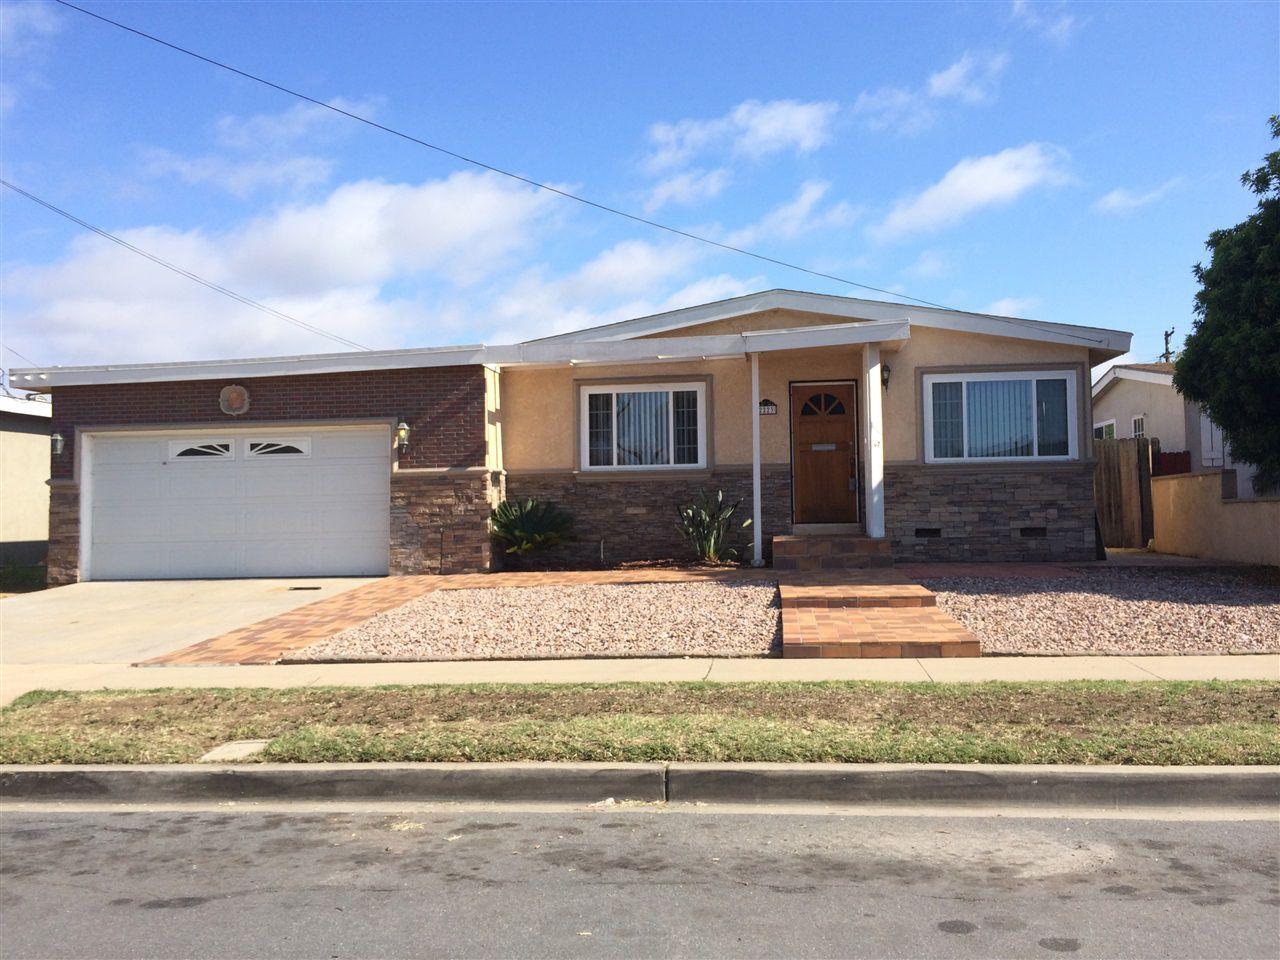 Main Photo: SAN DIEGO House for sale : 3 bedrooms : 2223 Hemlock